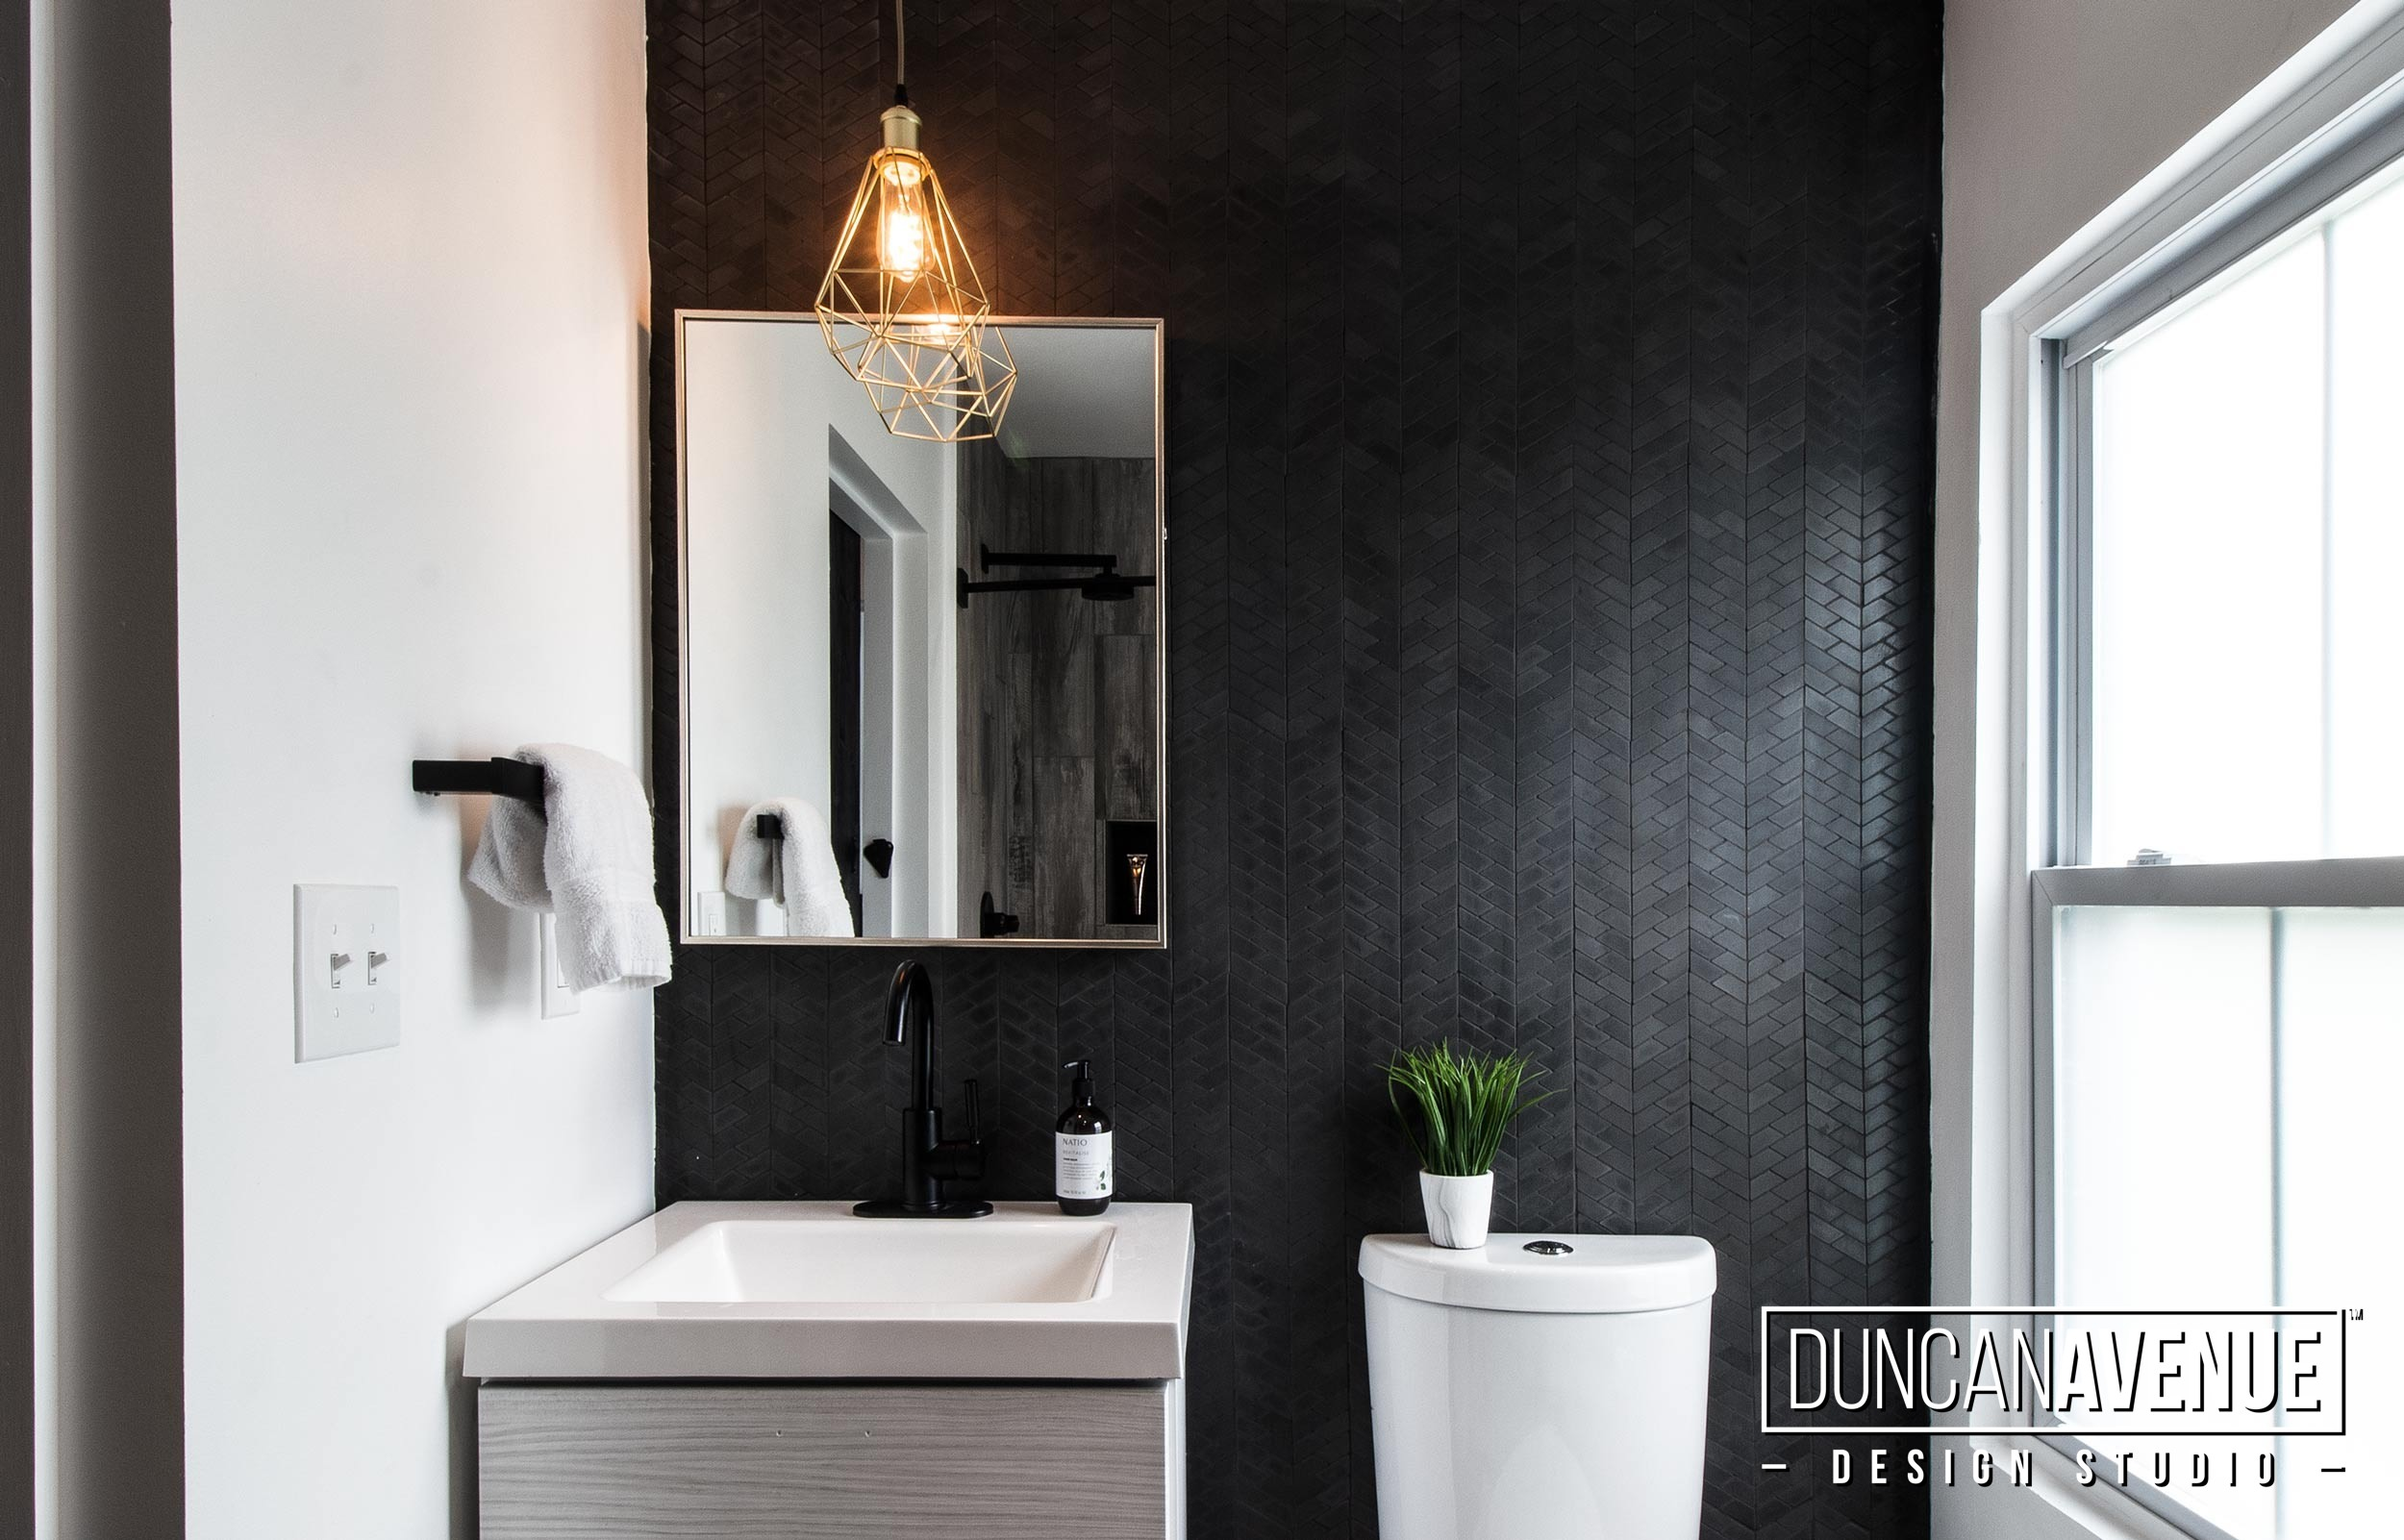 Bathroom Design - Farmhouse Reinvented - Interior Design Project by Duncan Avenue Studio / Maxwell and Dino Alexander